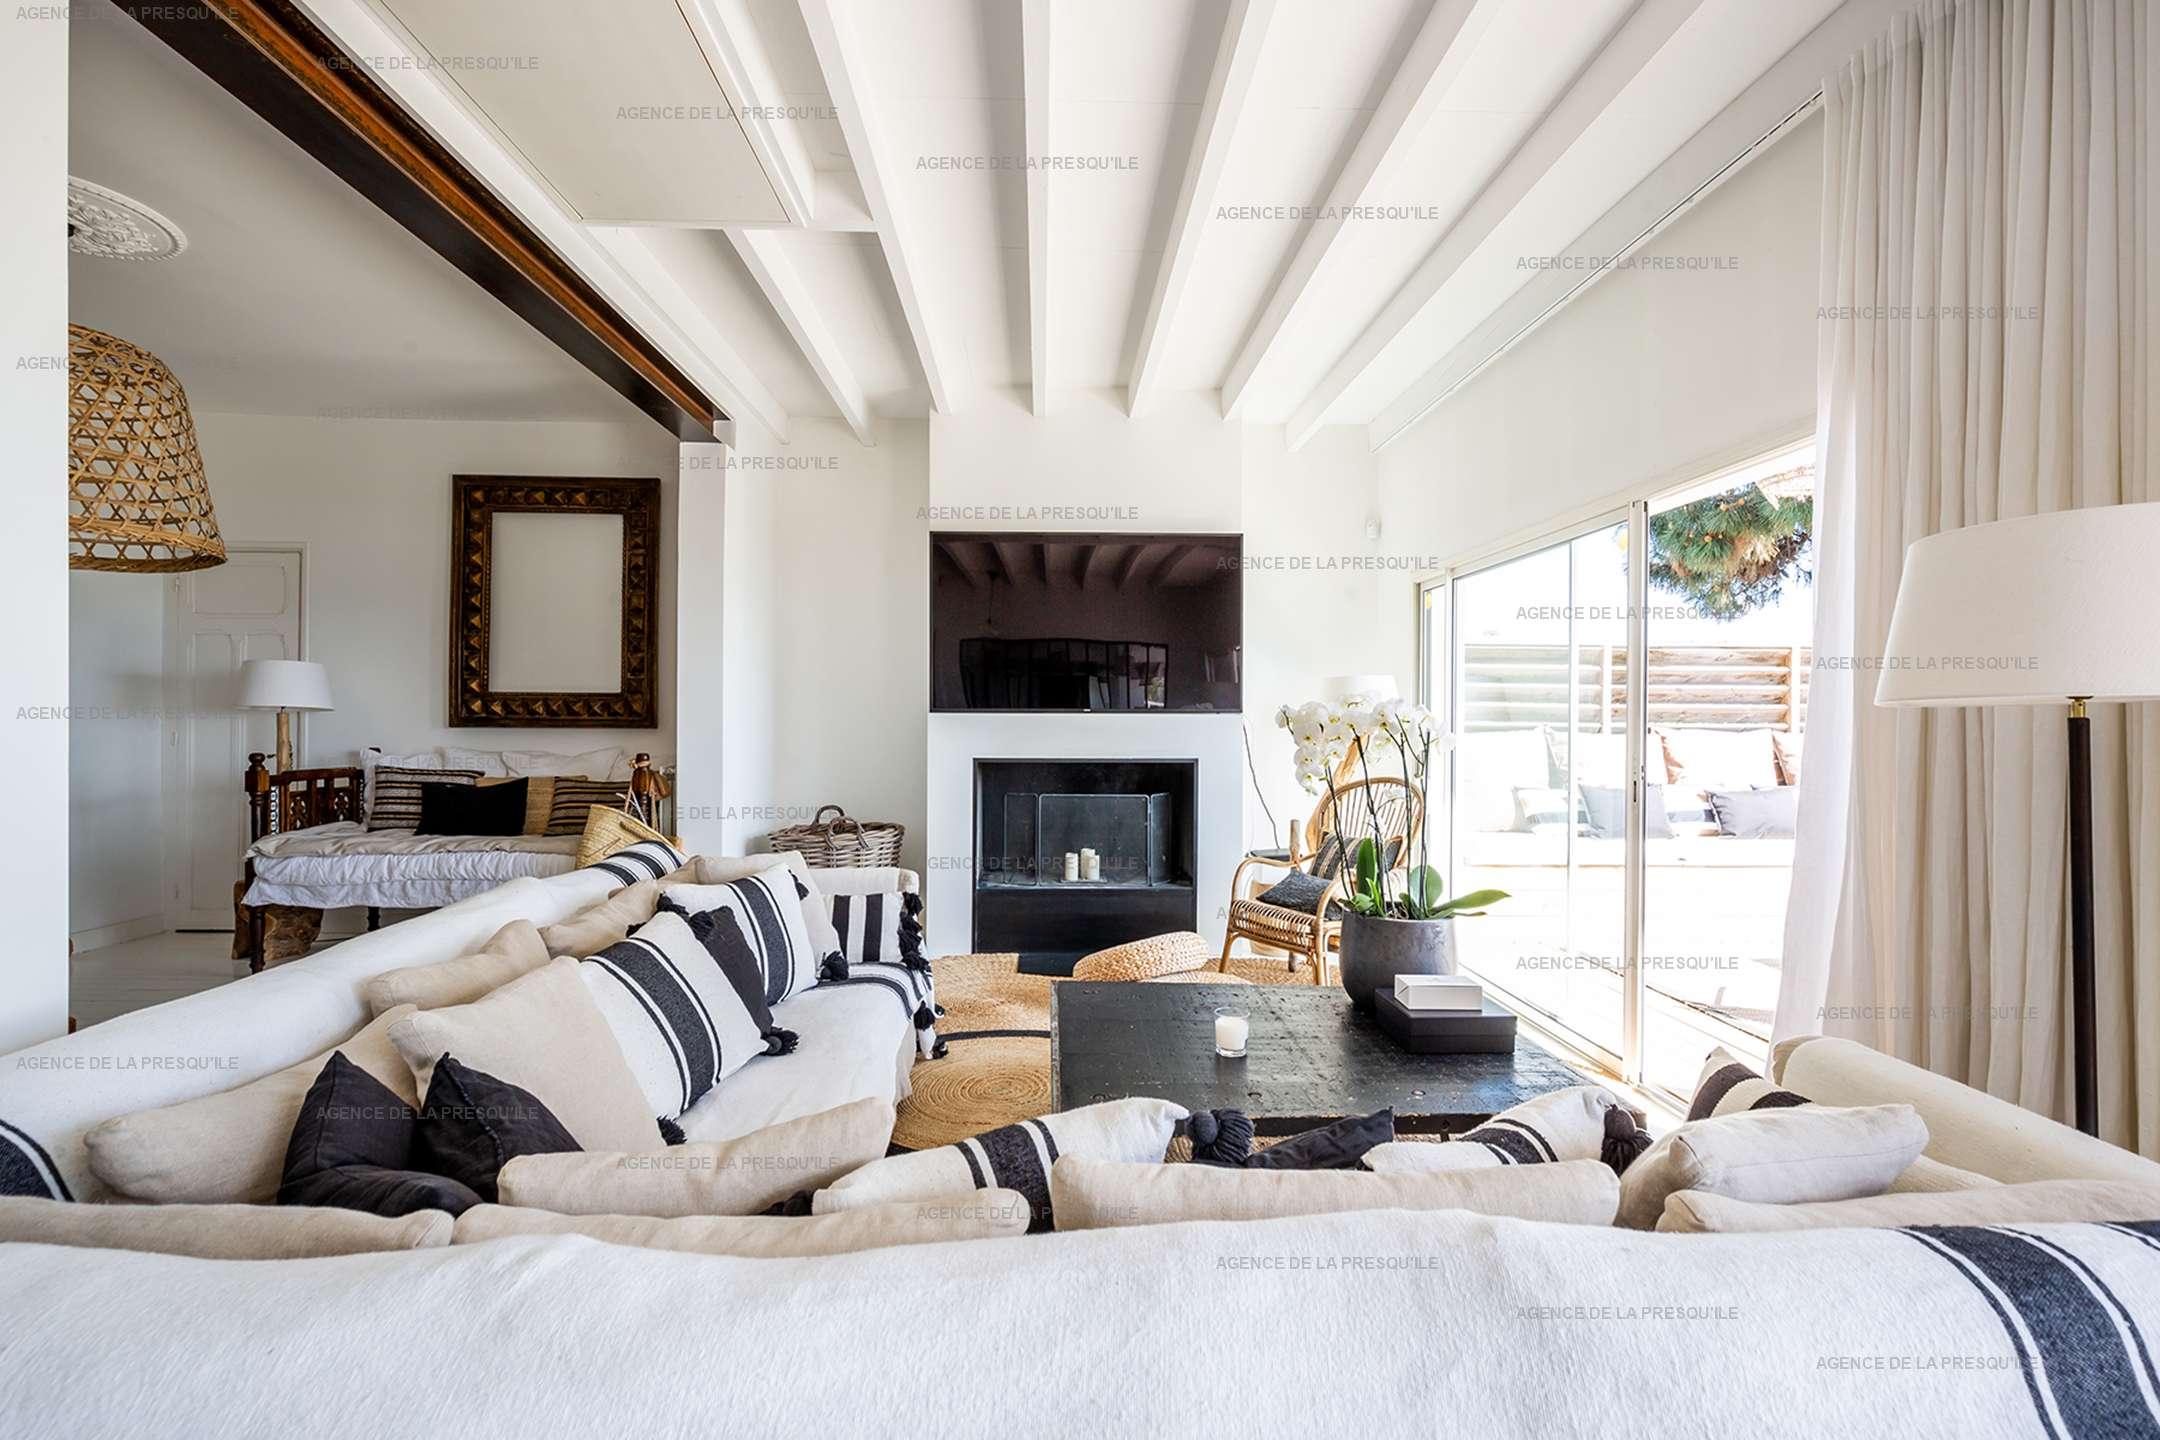 Location: Superbe villa avec vue bassin et piscine 4